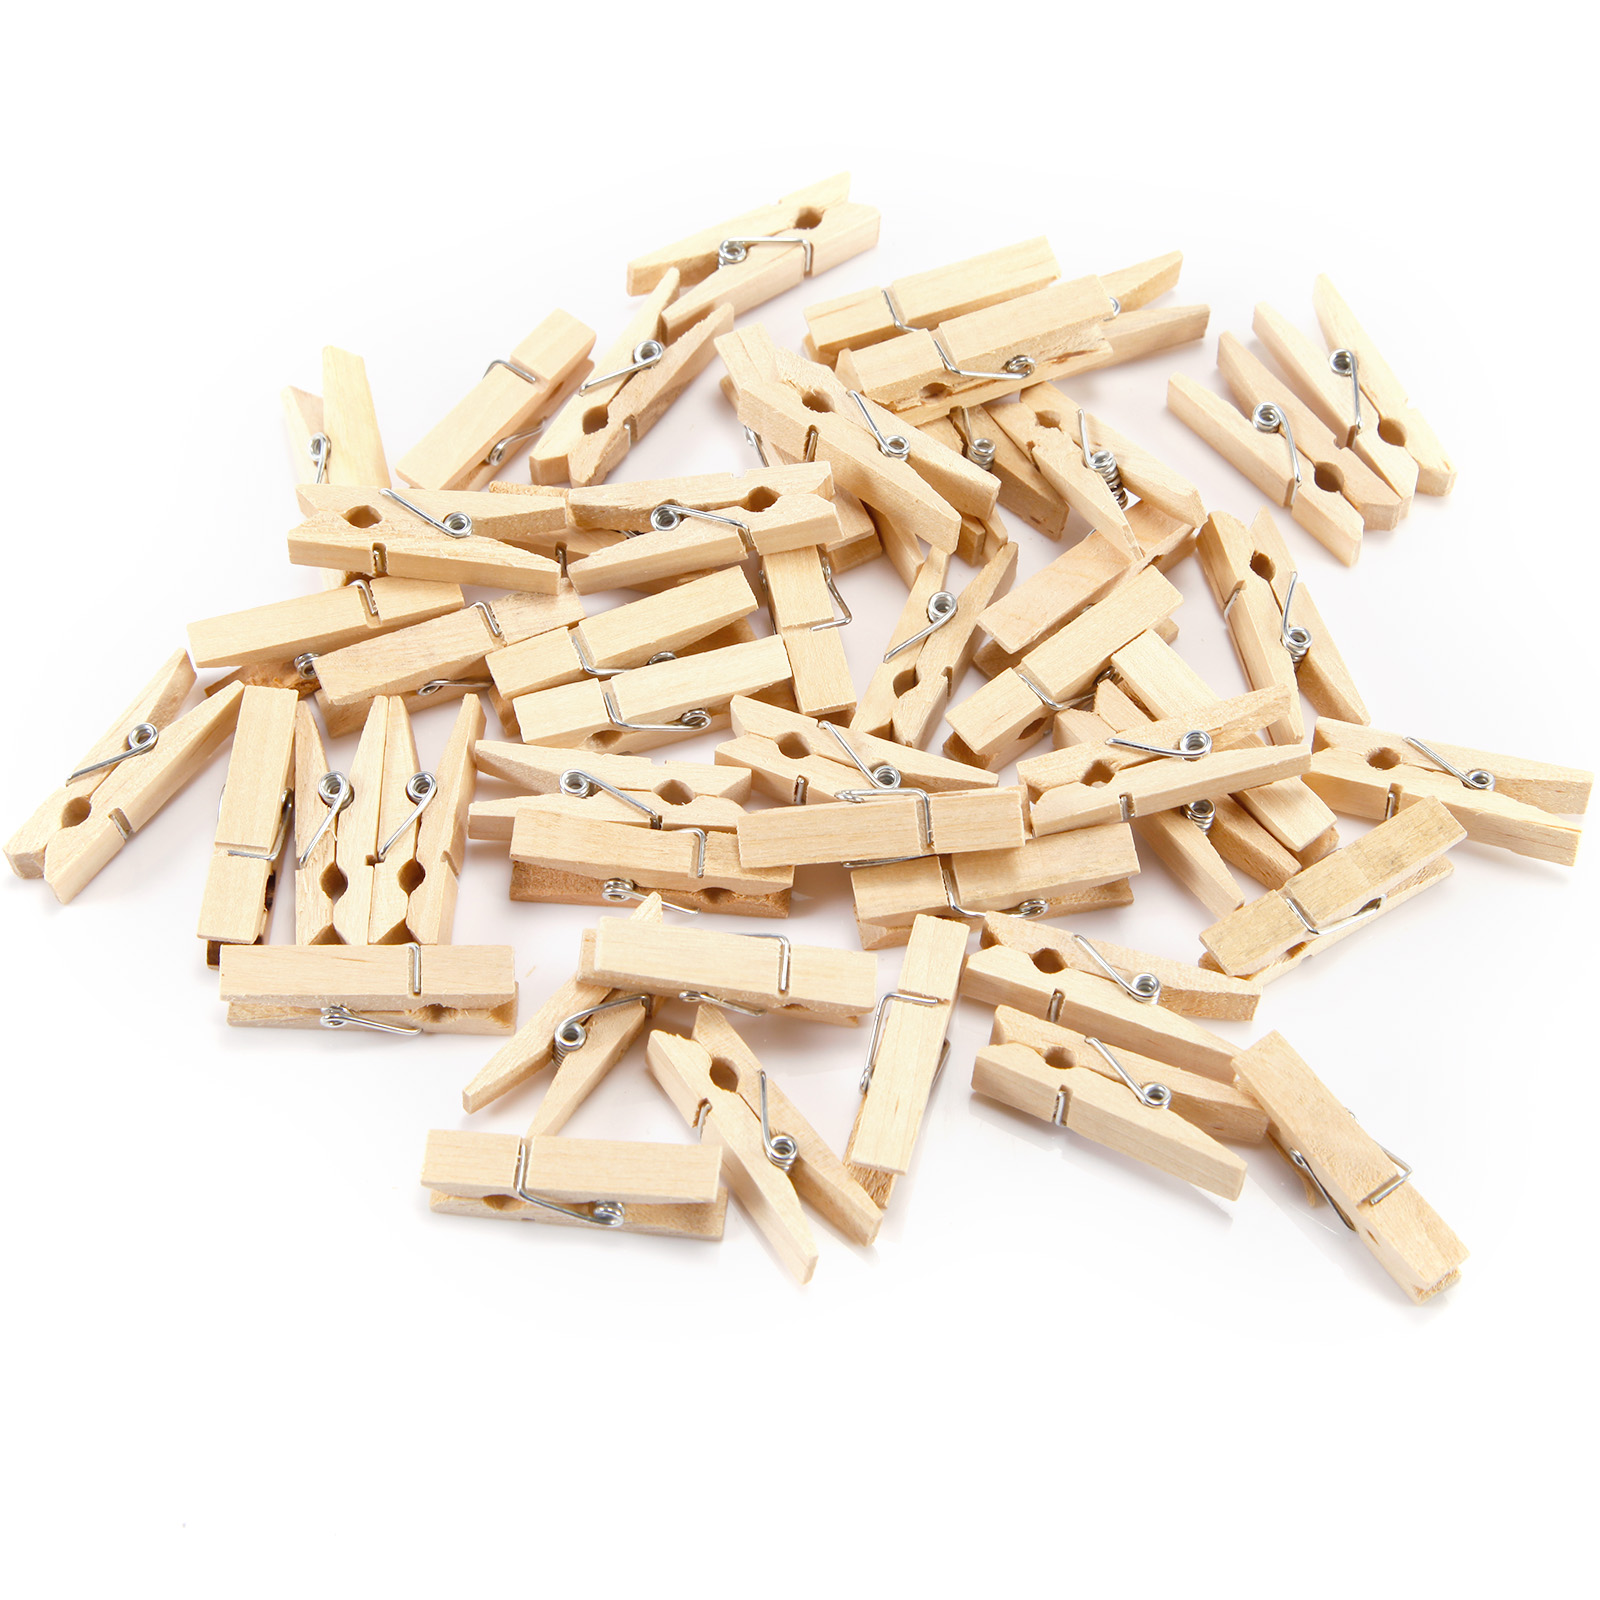 Holz mini clip w scheklammern 3 5cm klammer bastelklammern holzklammer ebay - Wascheklammern dekorieren ...